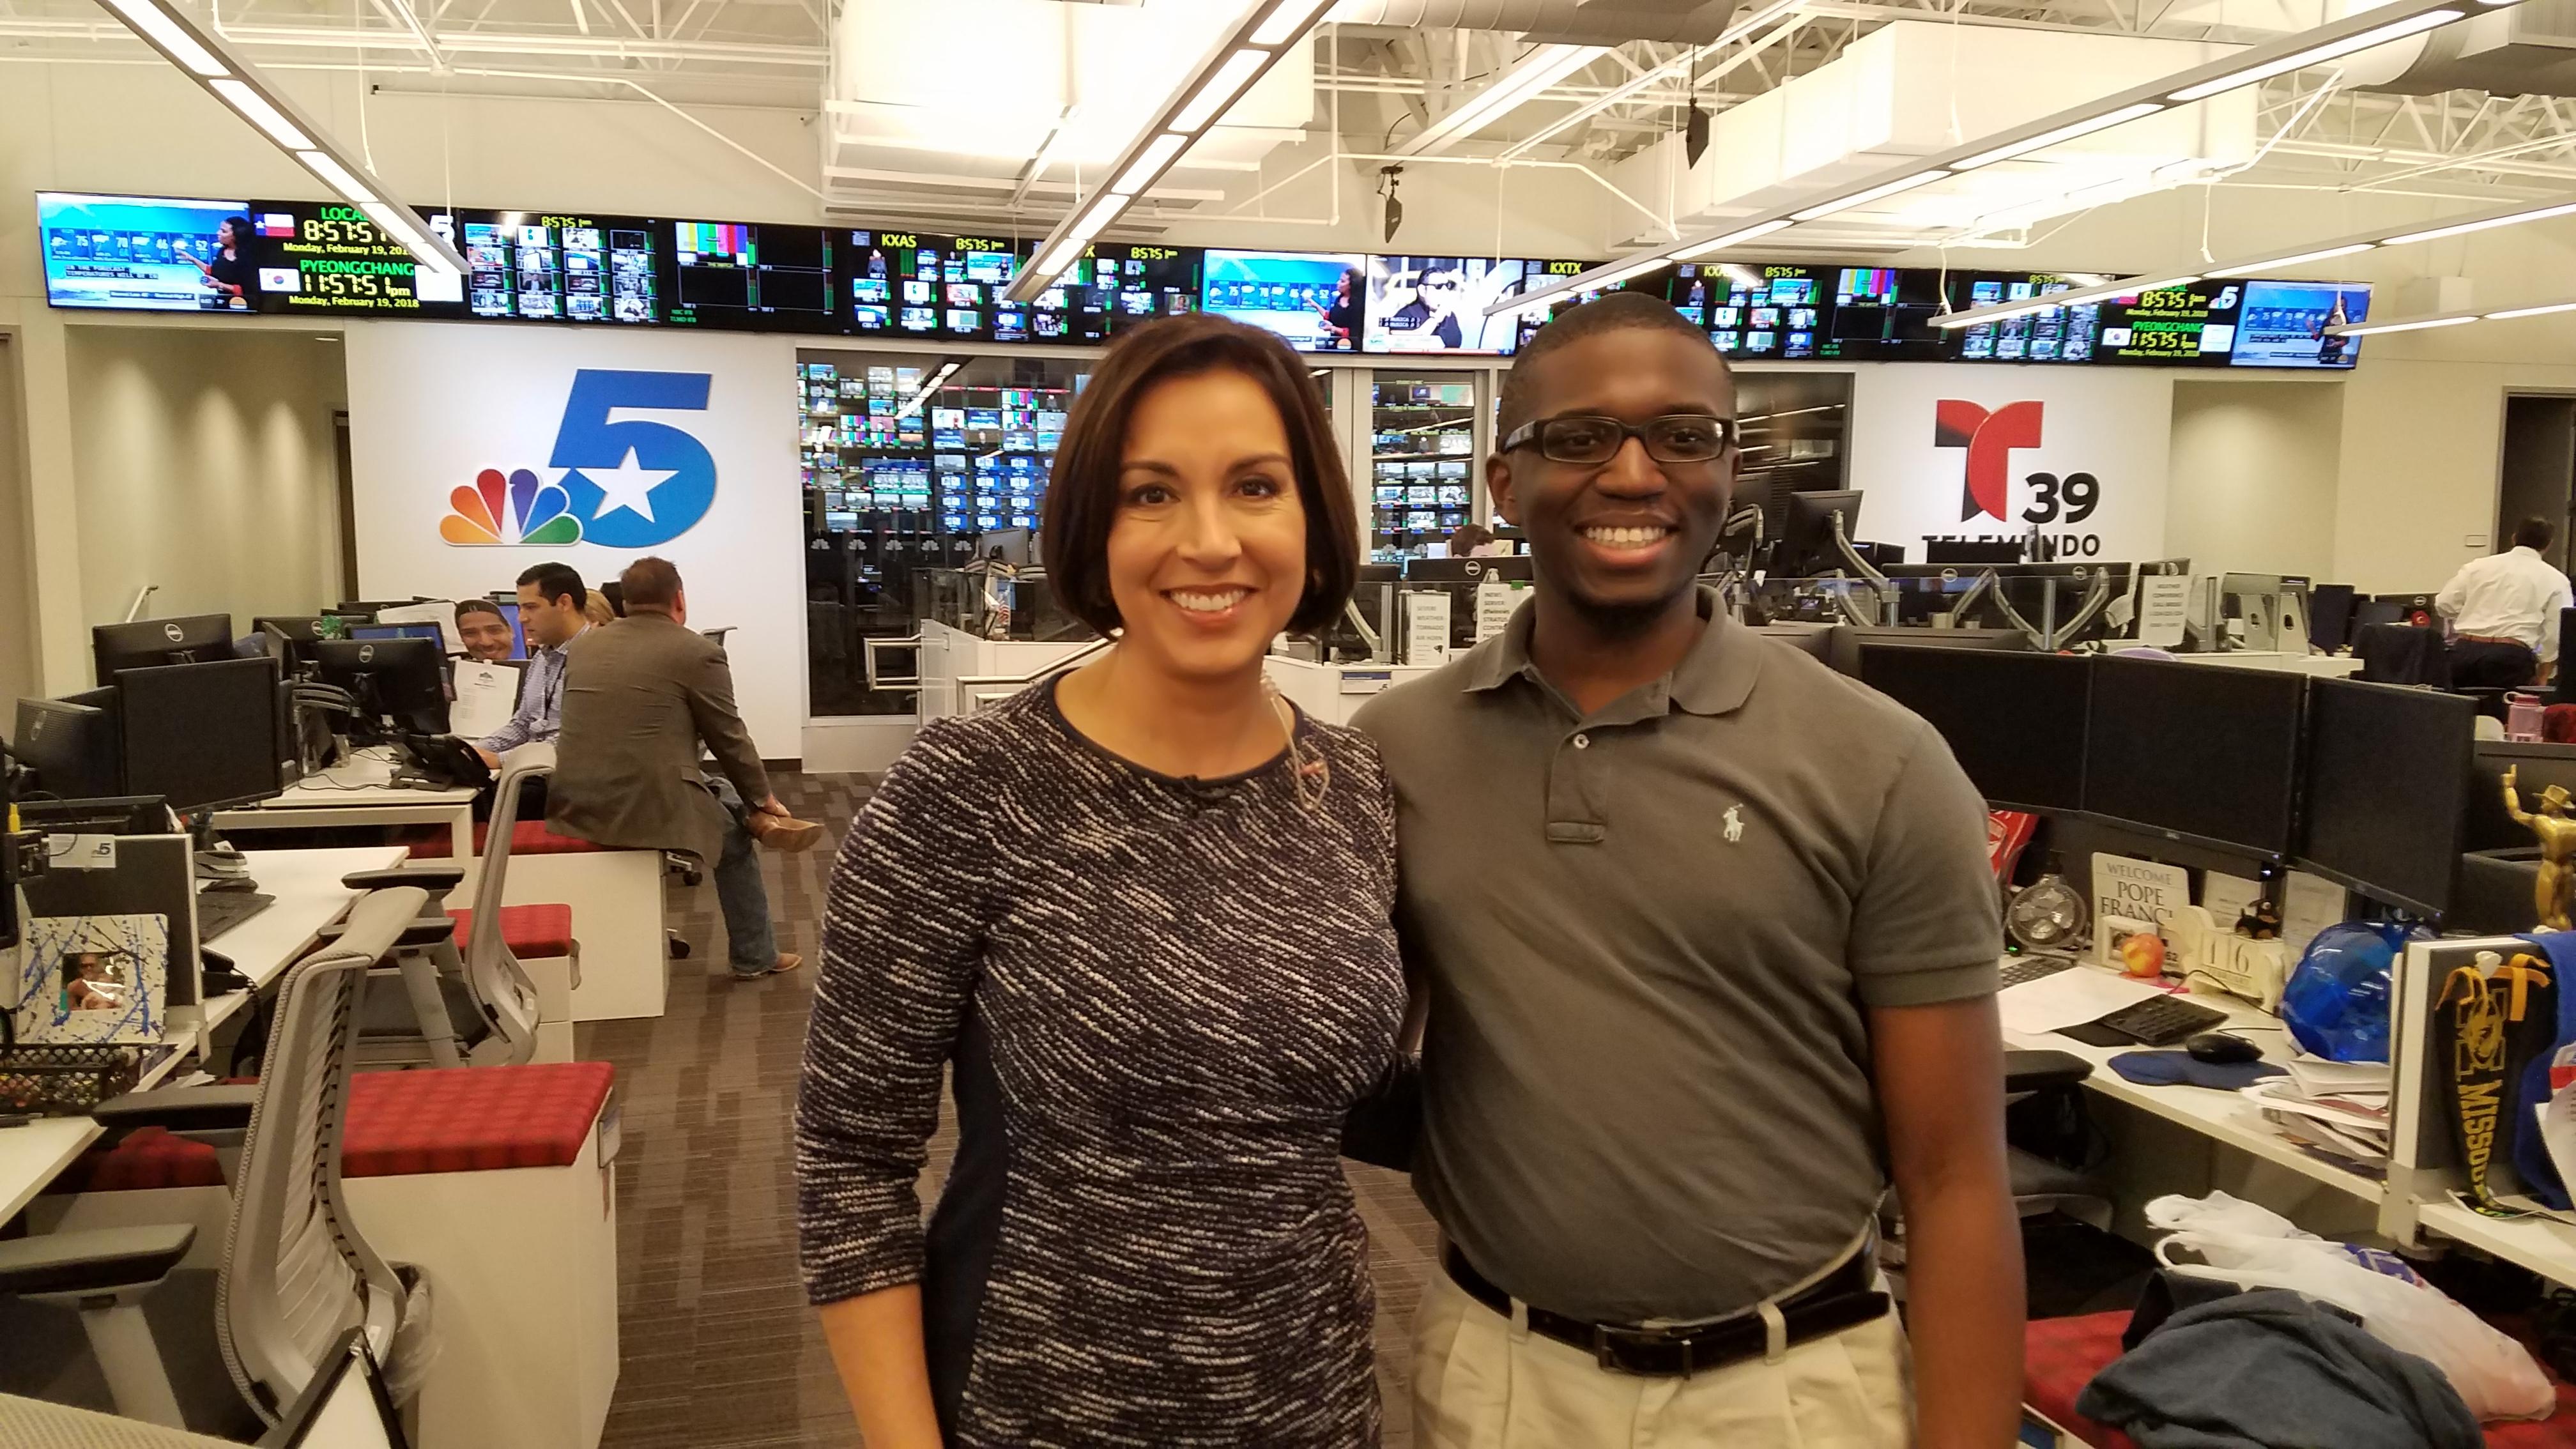 March Tech Alumni Watch – Award winning NBC 5 anchor/reporter Deborah Ferguson